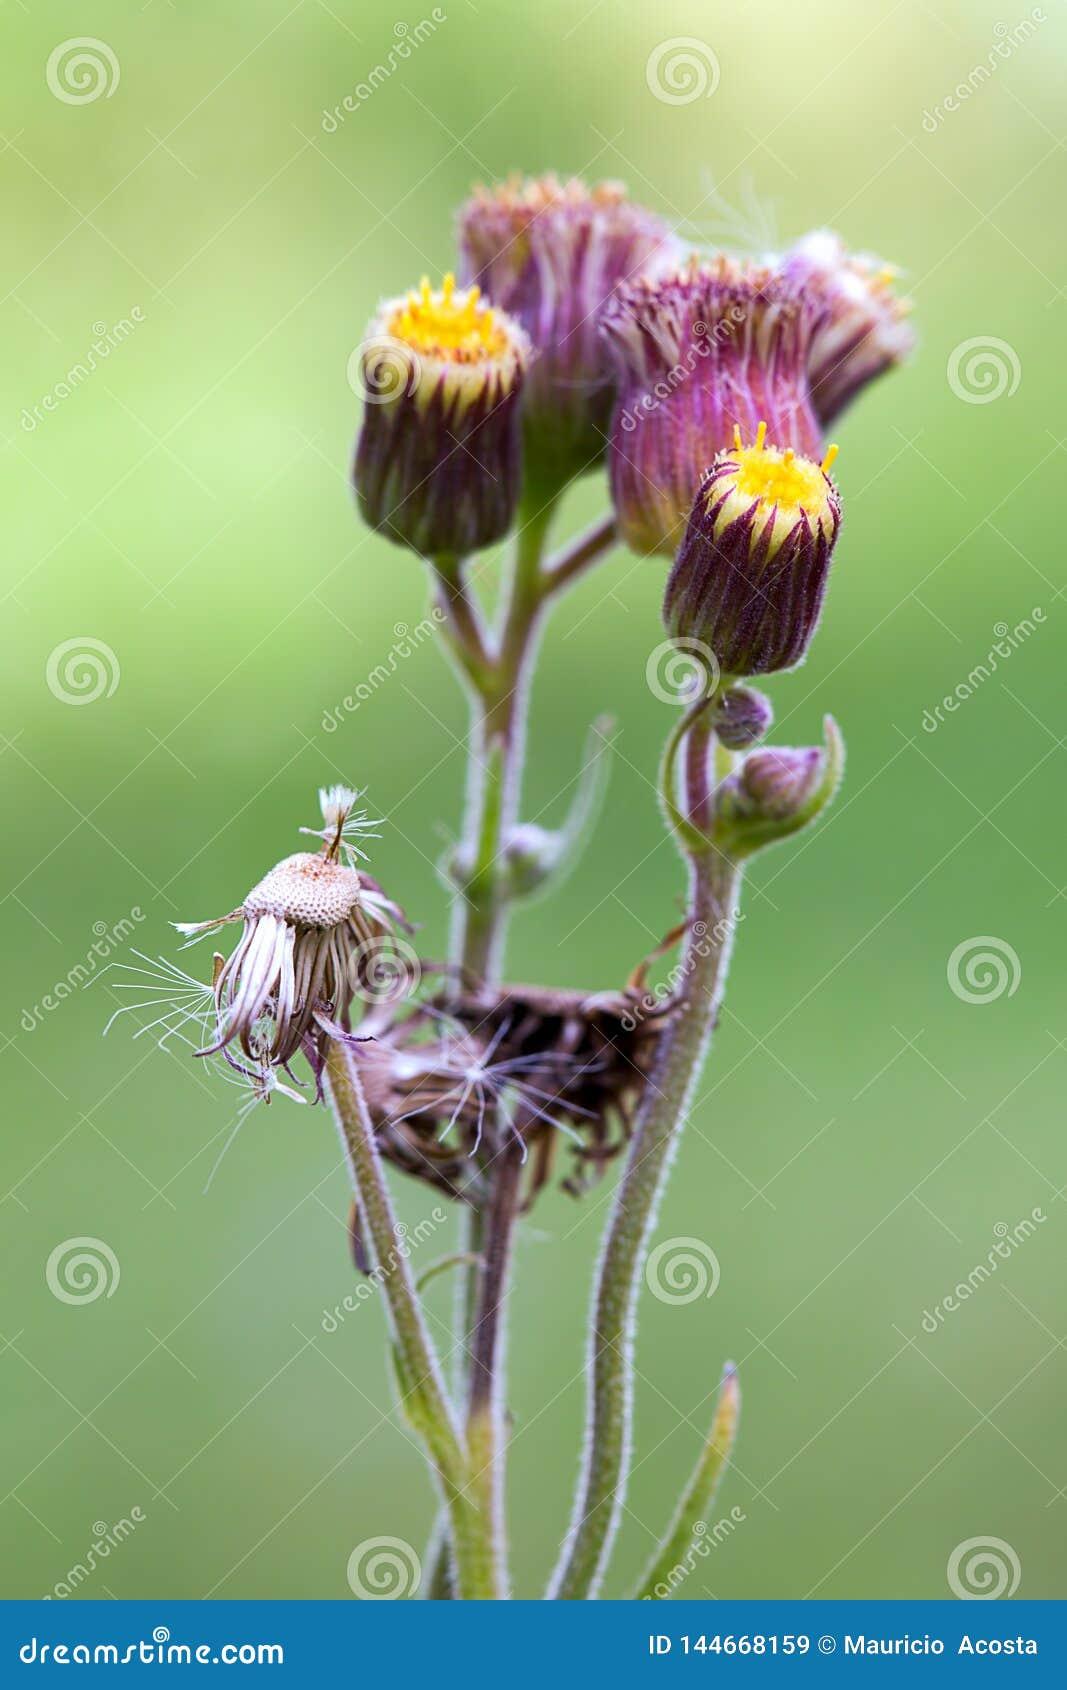 Diversas etapas florales de las flores del ironweed